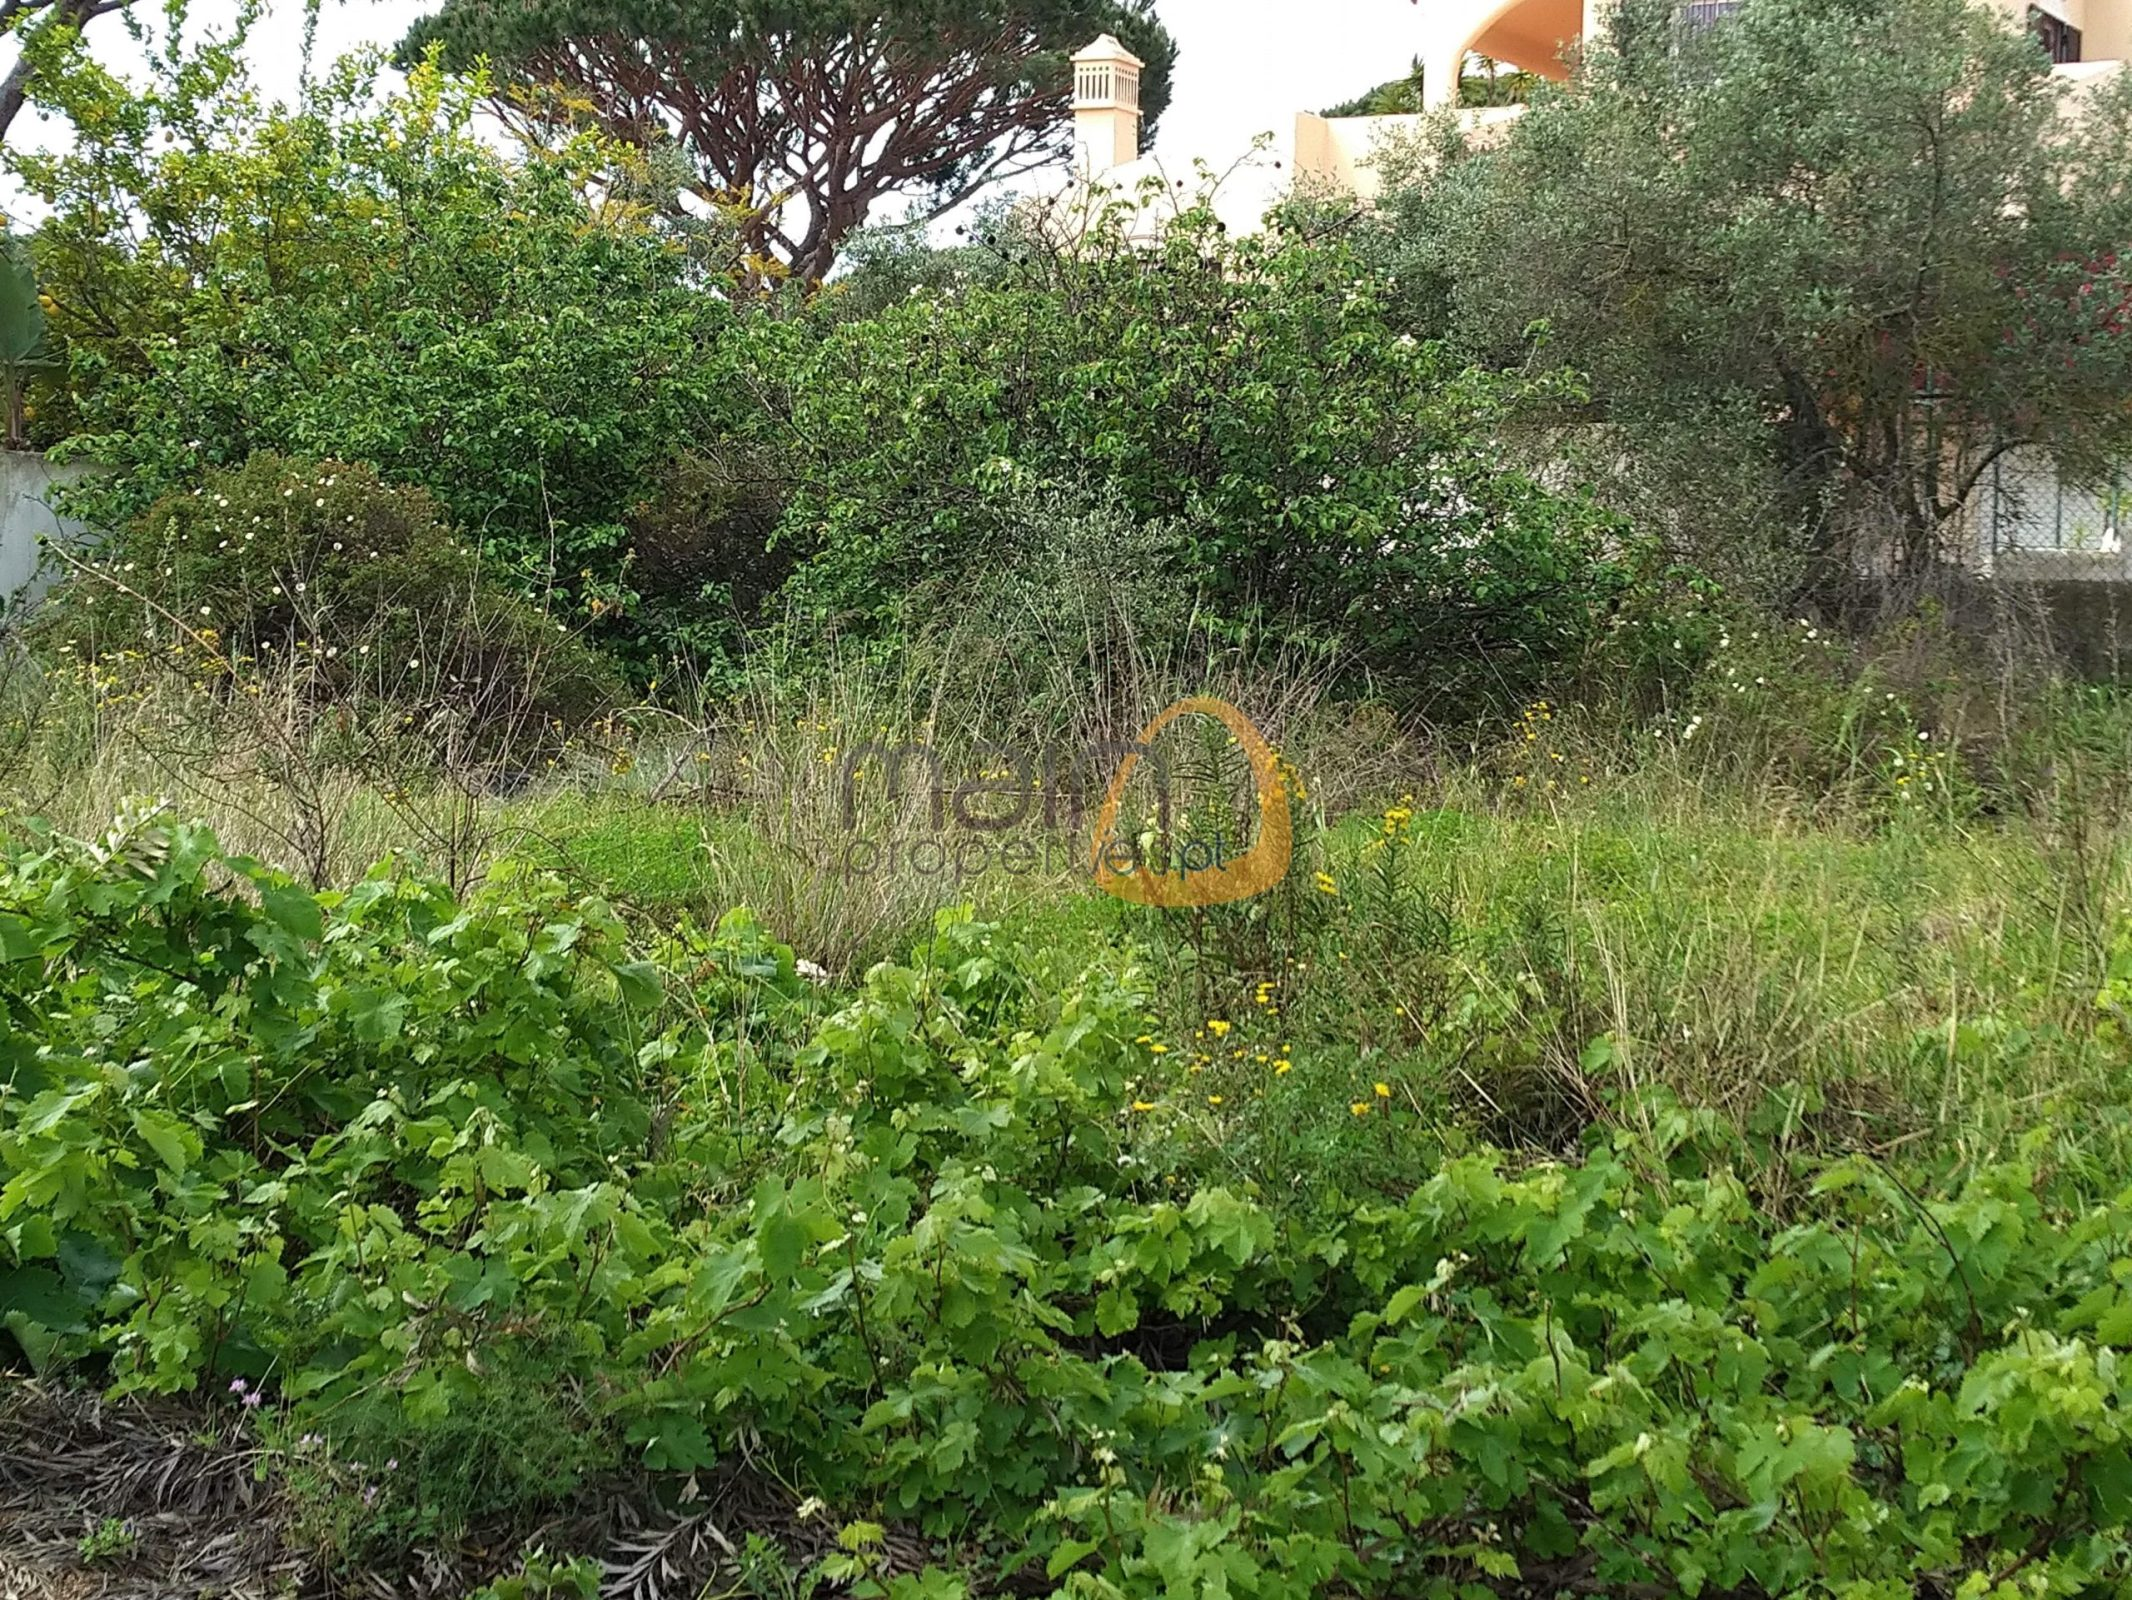 [:pt]Terreno para construção de moradia em Montenegro - Faro : Algarve : Portugal : Terreno 14 :: MR039[:en]Land for Villa construction in Montenegro -  Faro : Algarve : Portugal :: Land 14 :: MainProperties :: MR039[:]